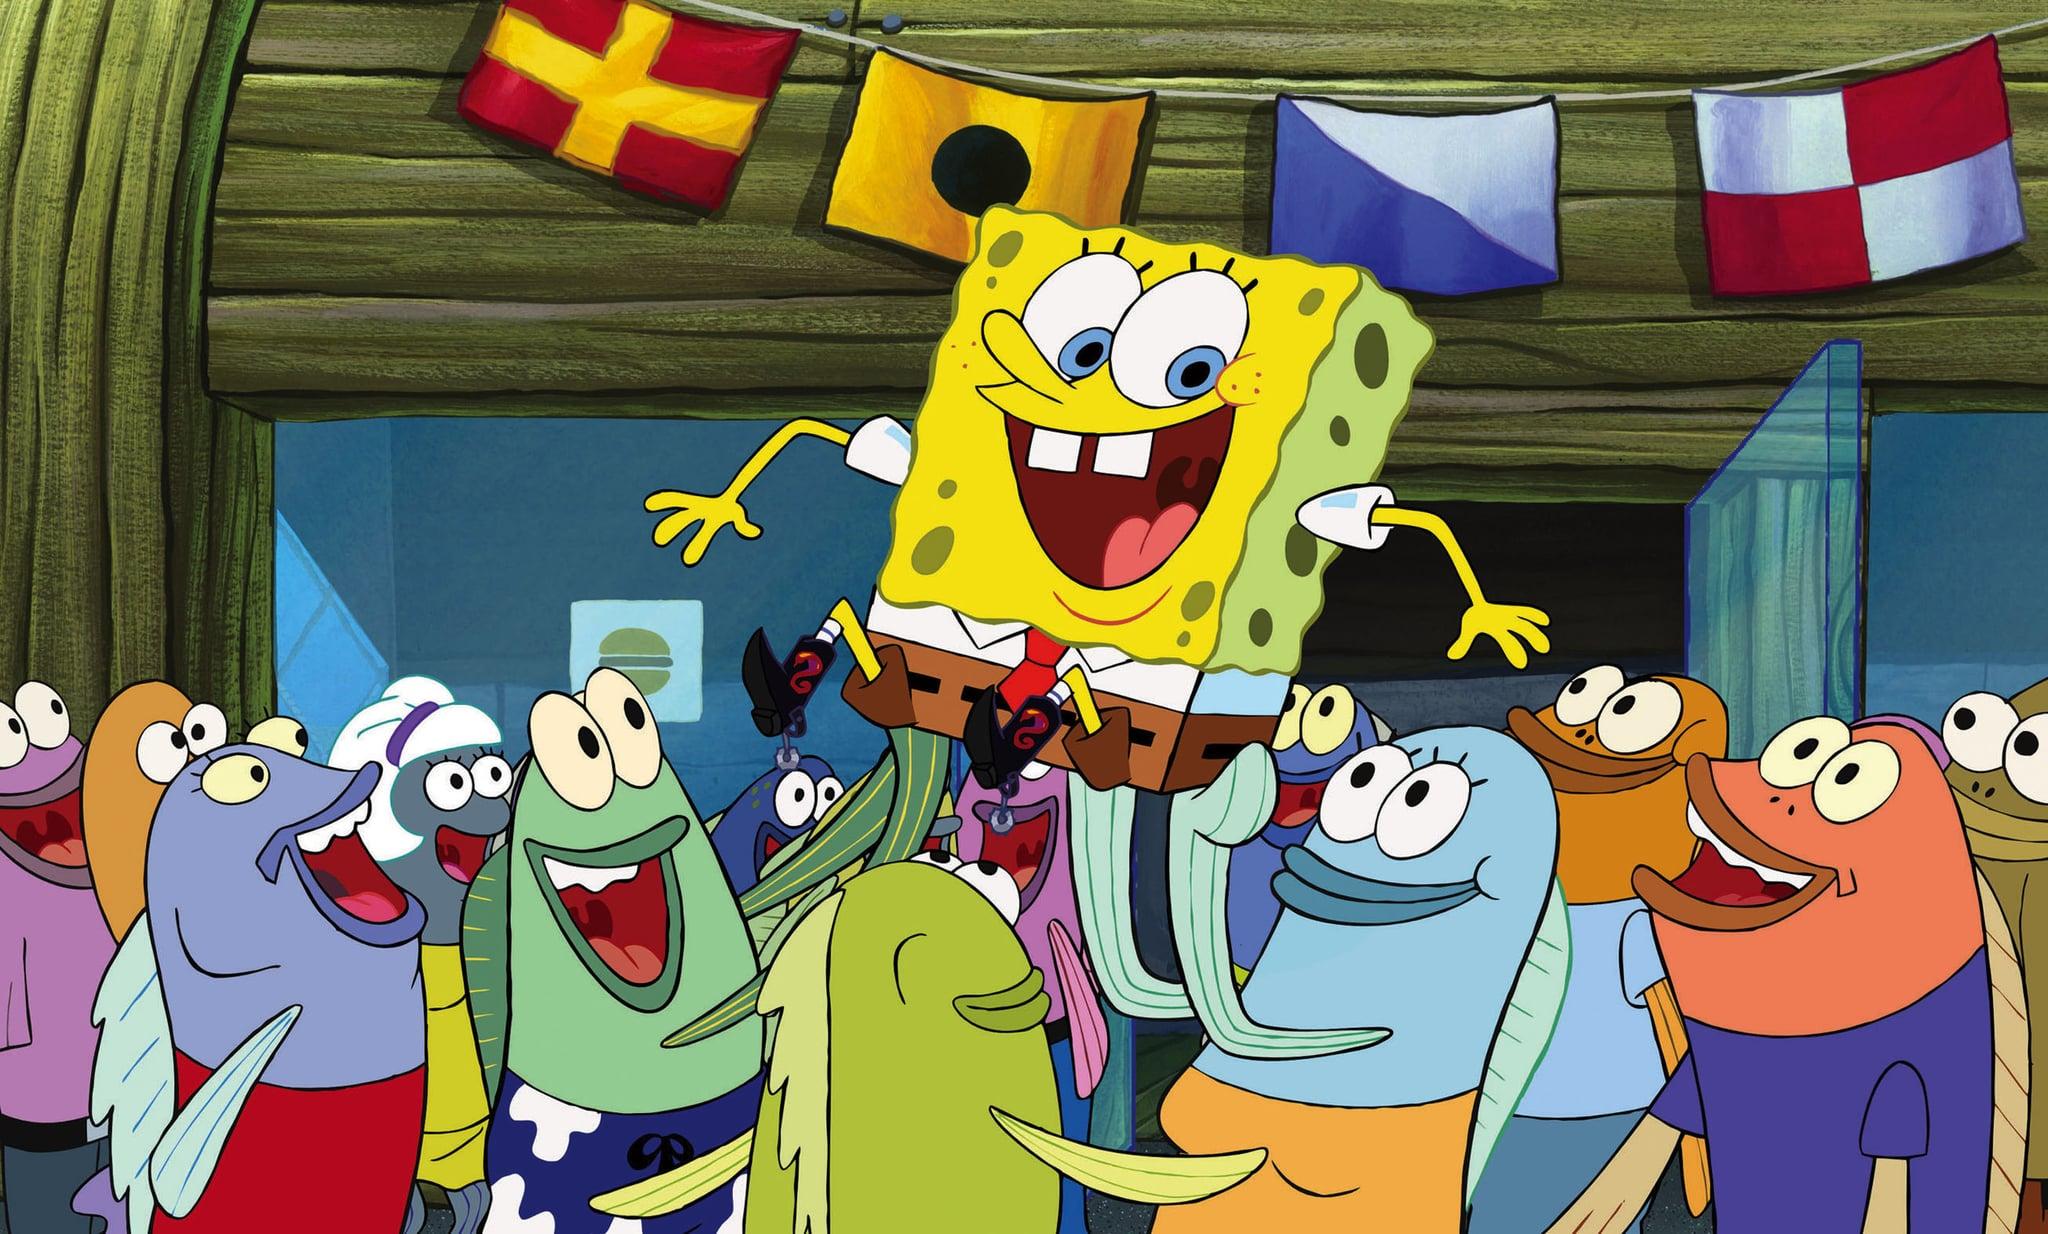 THE SPONGEBOB SQUAREPANTS MOVIE, Spongebob Squarepants, 2004, (c) Paramount/courtesy Everett Collection